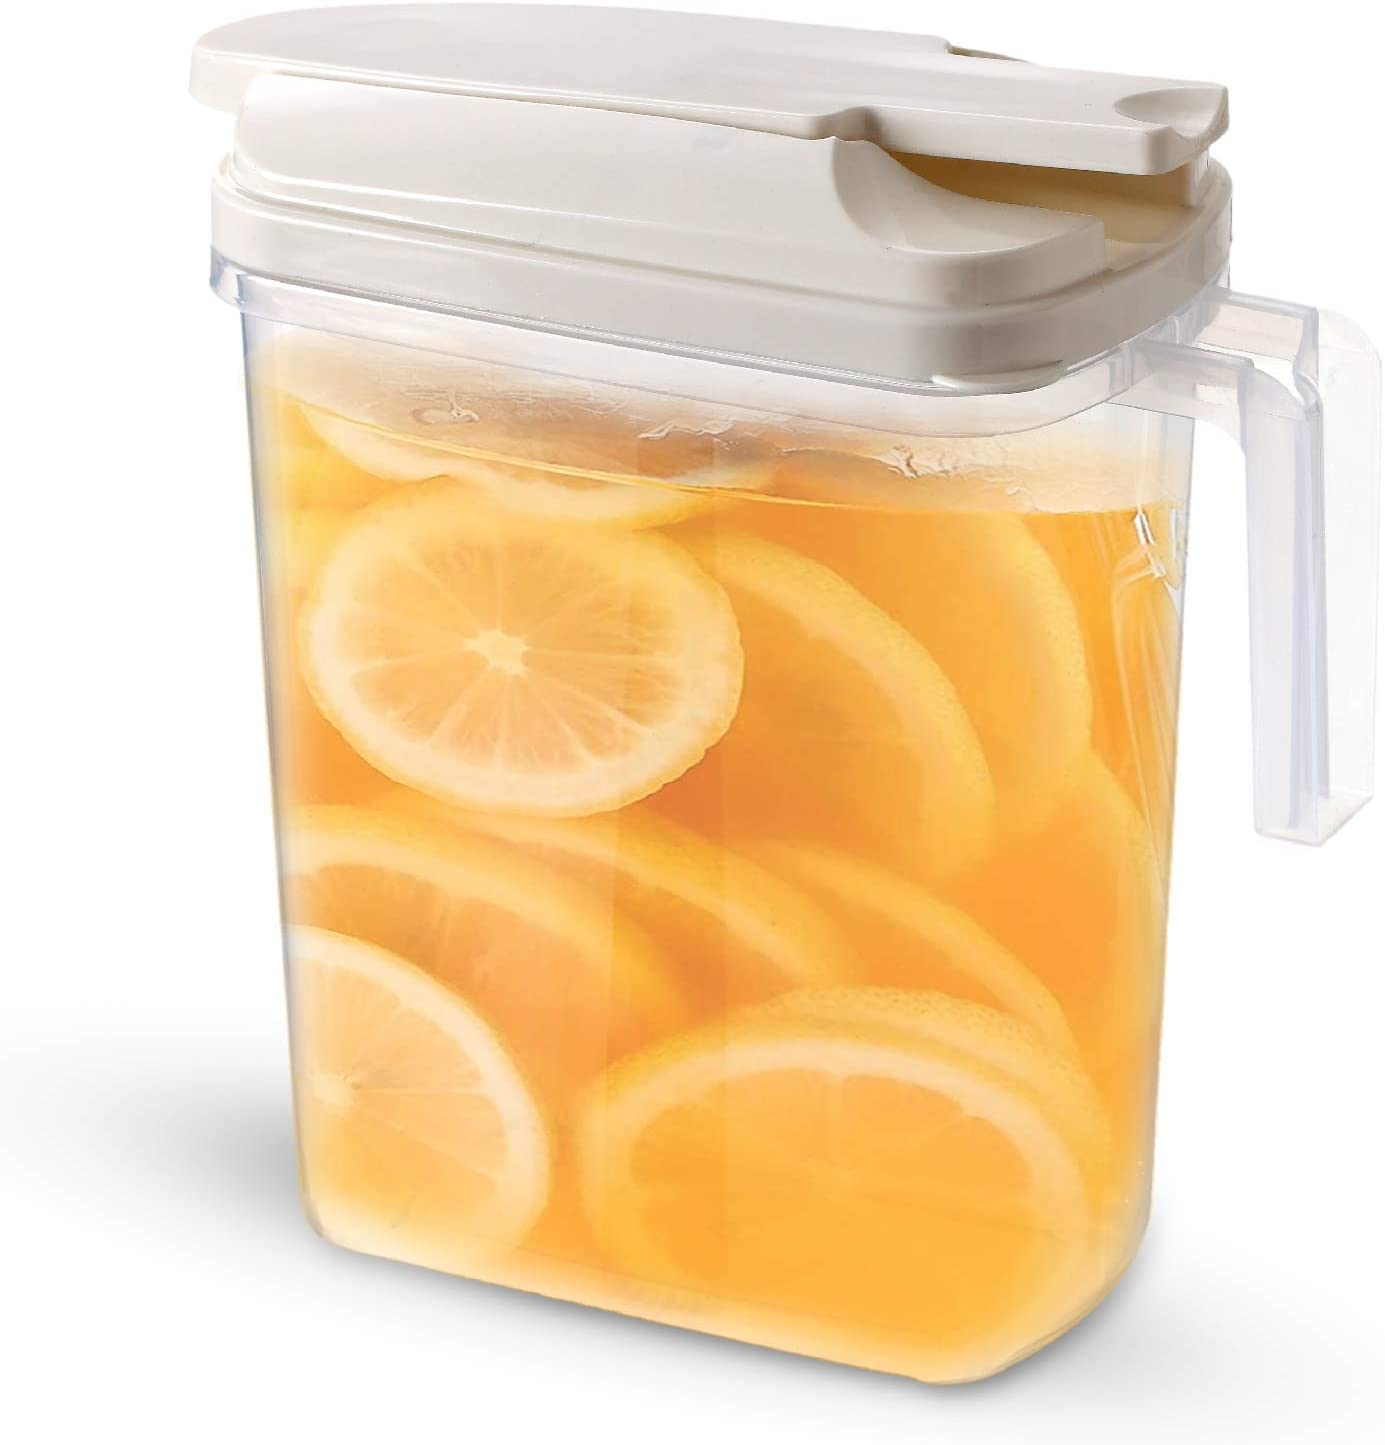 Large Pour Airtight plastic drink Pitcher jar with Locking Spout lid and Handle. Water Coffee, lemonade, iced Tea & juice 67oz/2 Quart/half gallon. Detachable Top. Slim design. Safer than glass. Jarra